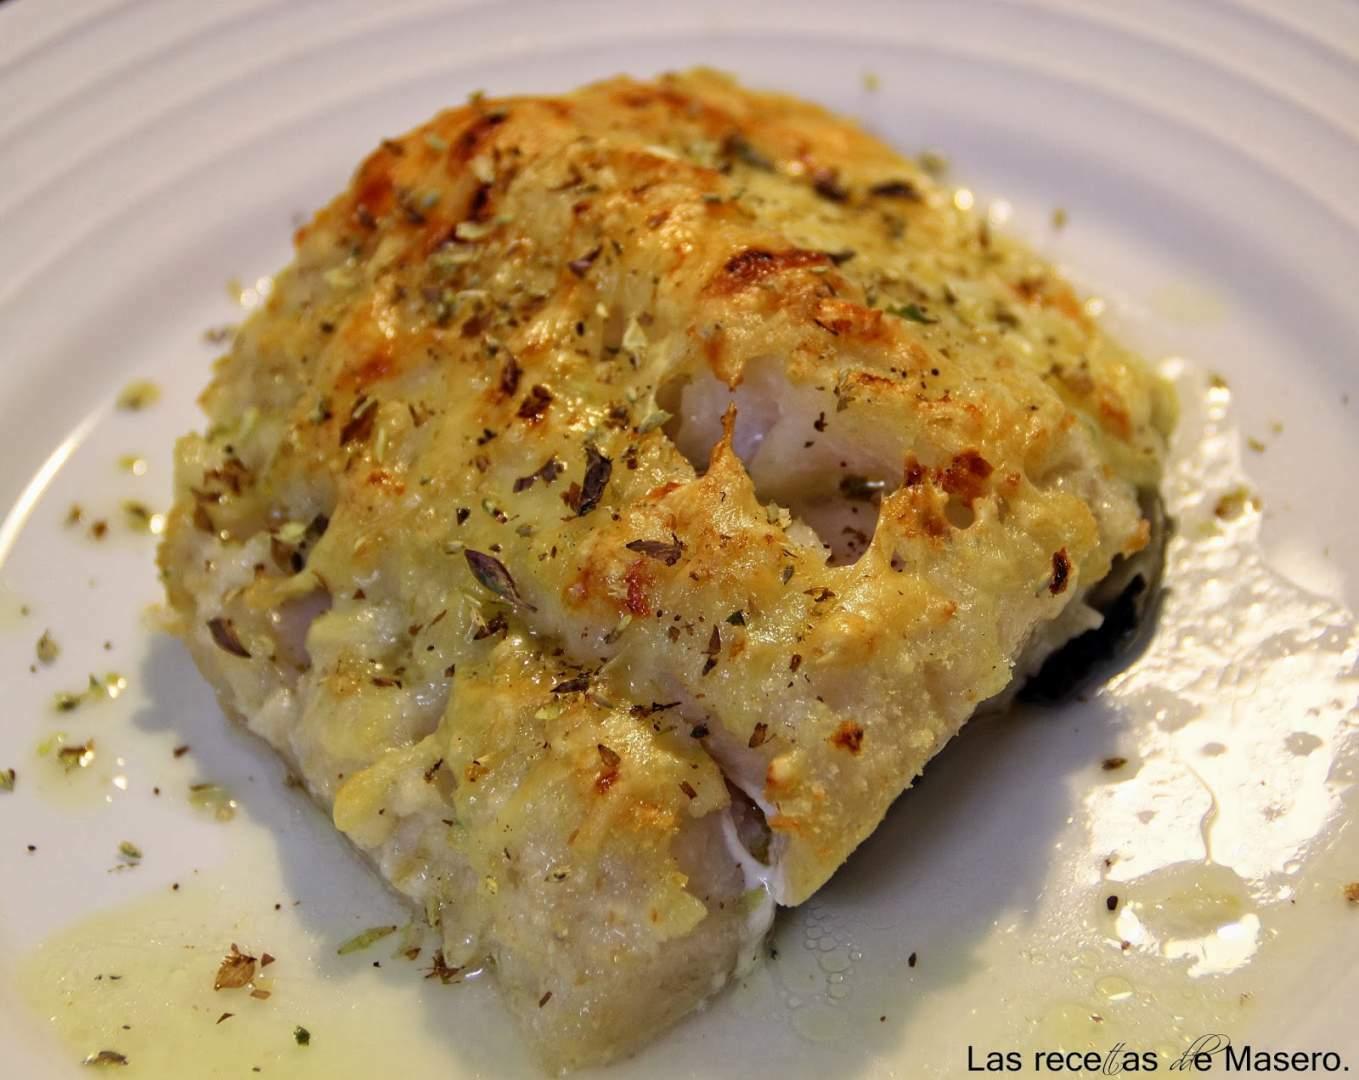 Bacalao al horno receta petitchef for Cocinar gambas al horno